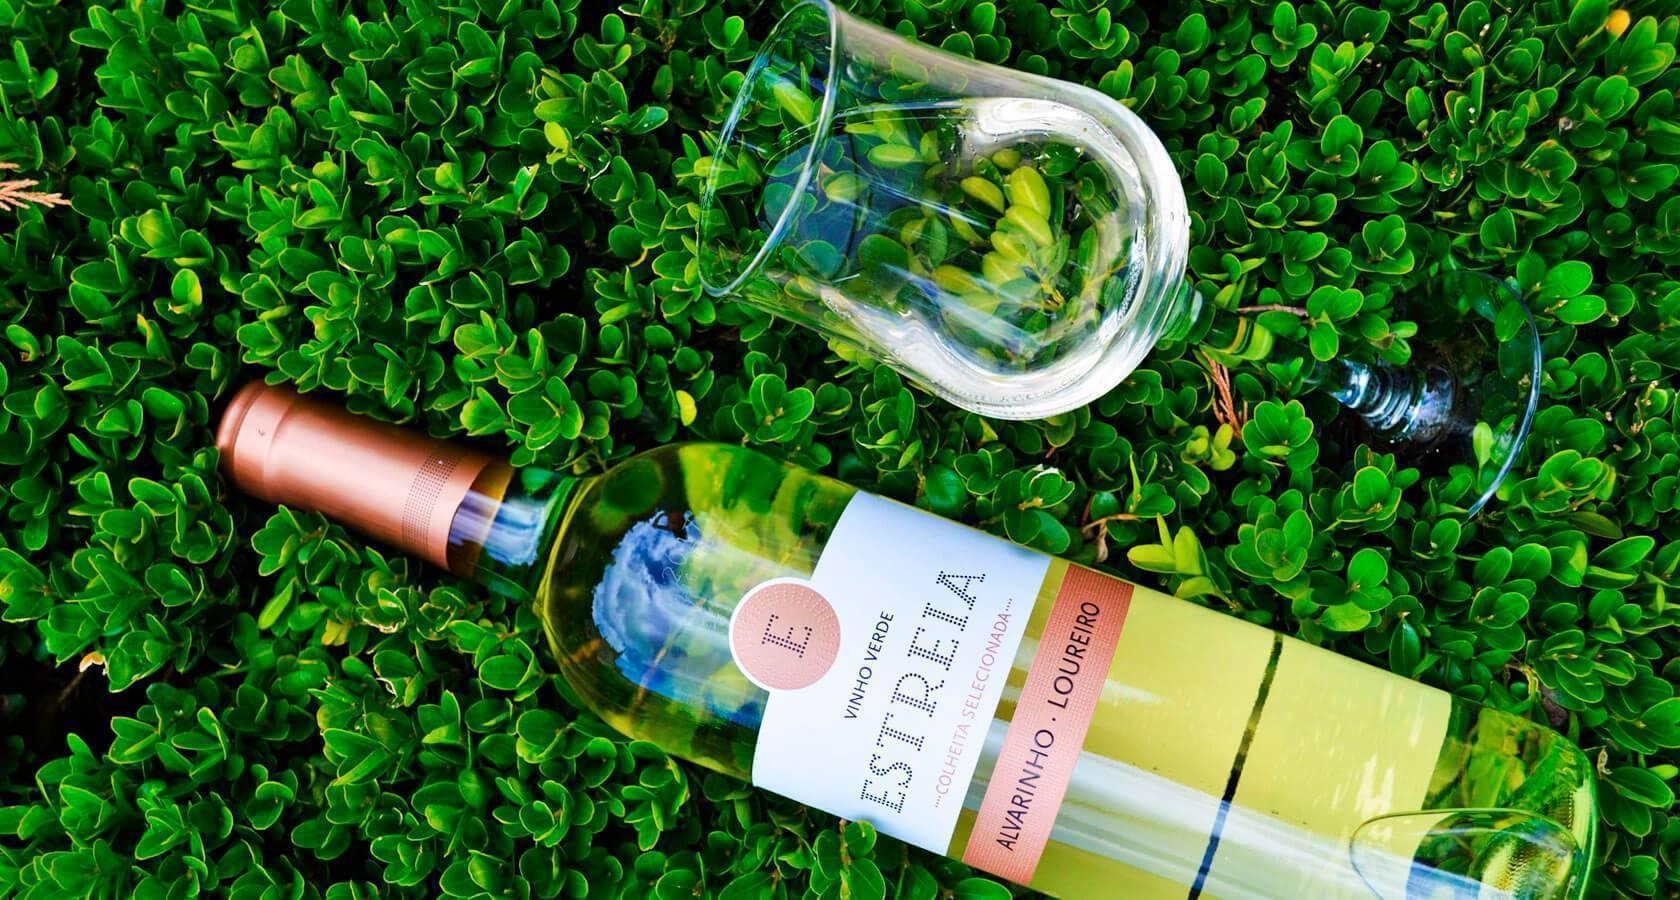 Vinho verde – регион производства, история, технология, стили зеленого вина ⛳️ алко профи